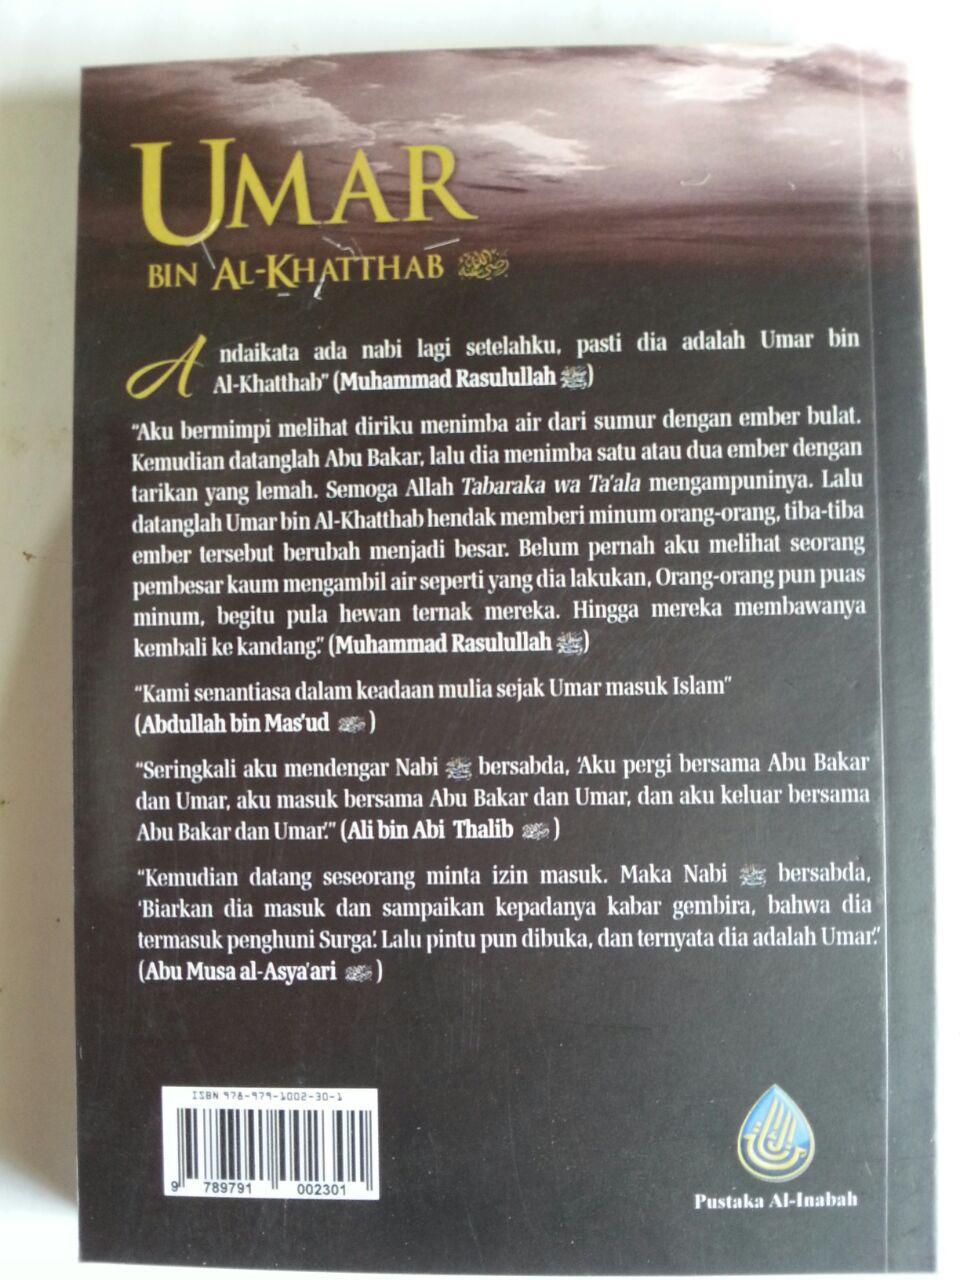 Buku Serial Khulafa Ar-Rasyidin 1 Set 4 Jilid cover 3